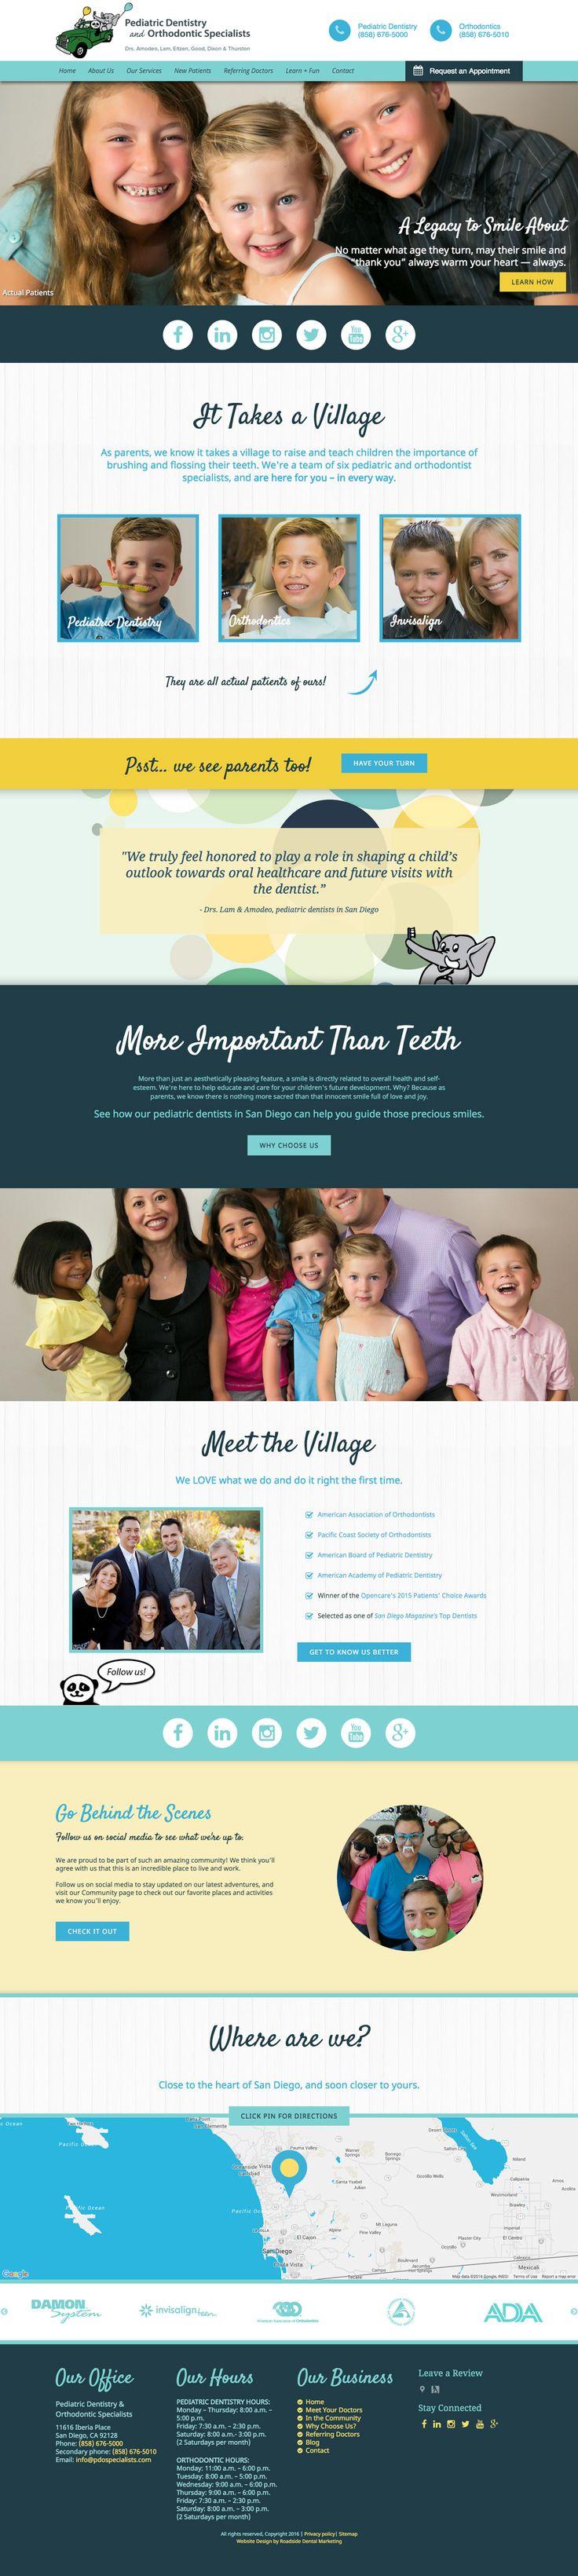 Responsive pediatric dentist website design by Roadside Dental Marketing #dental #website #design #responsive